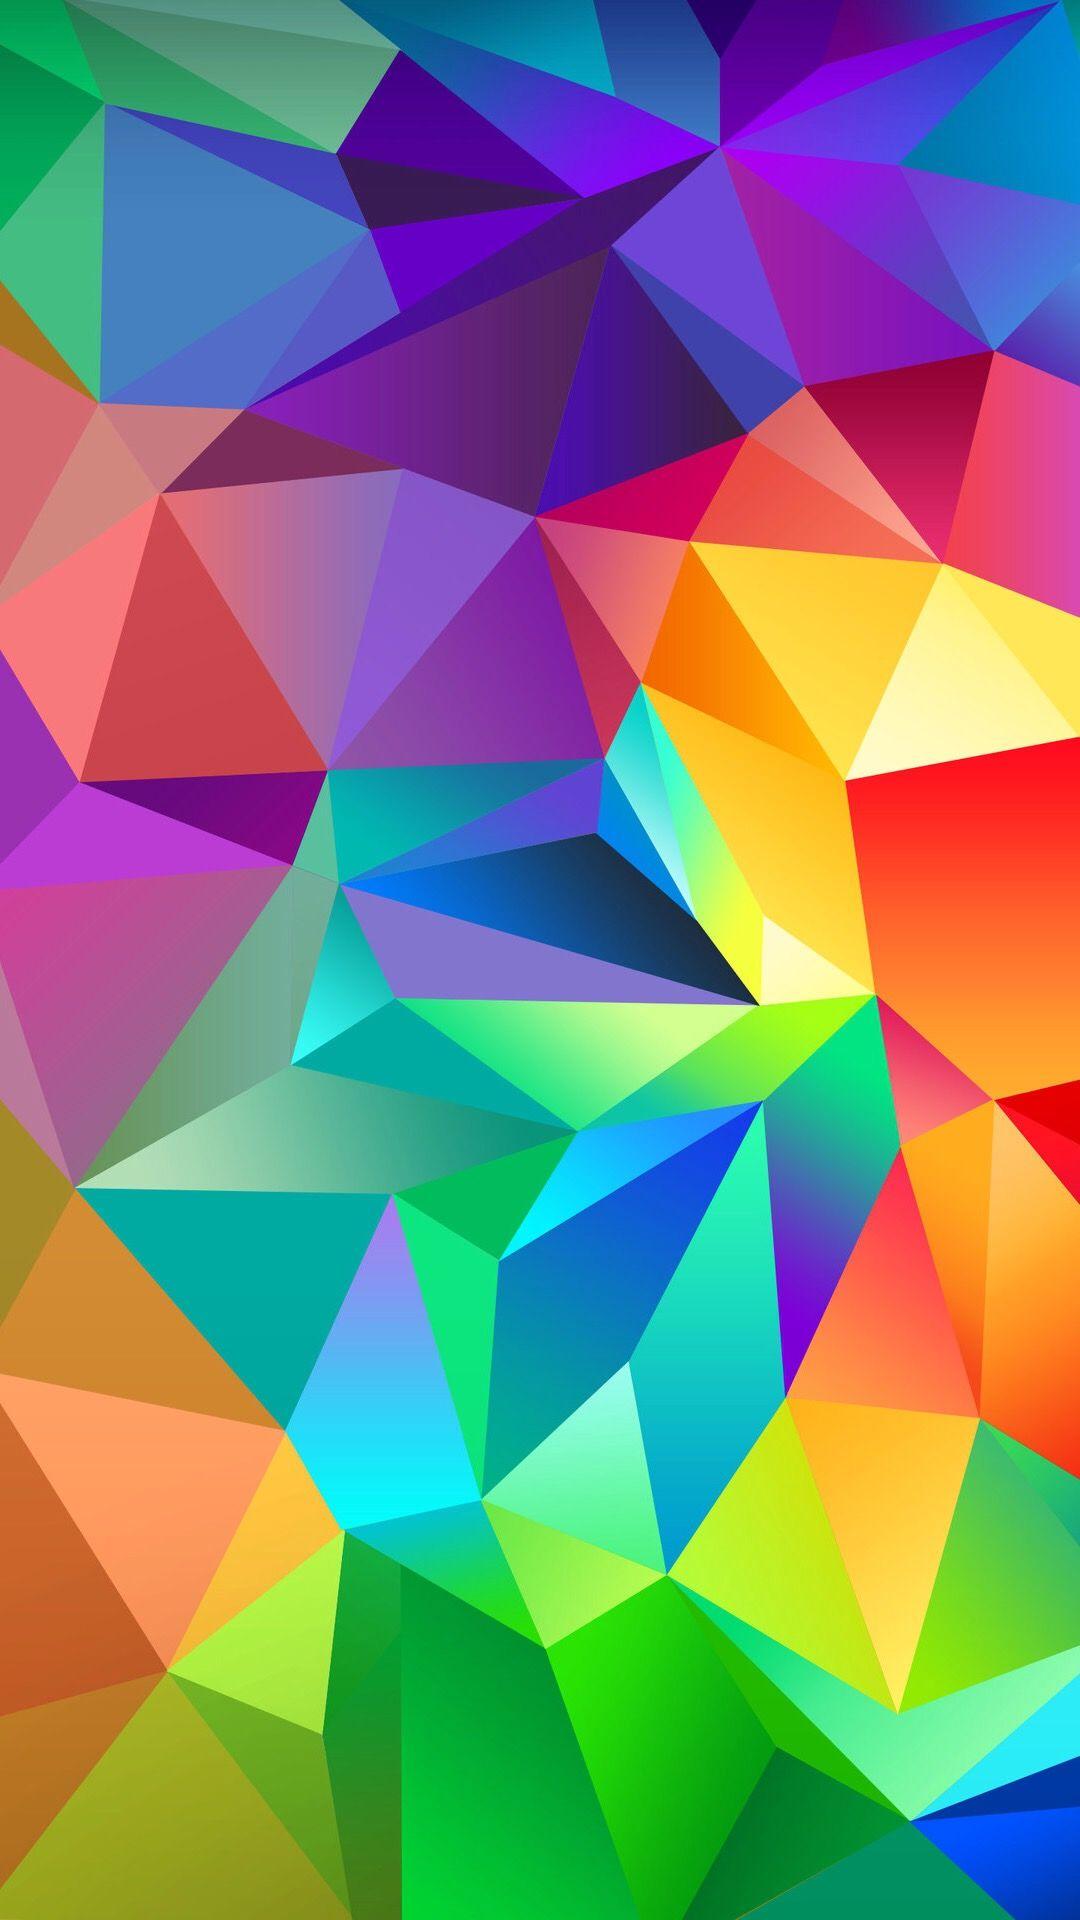 Rainbow. ☺ 💛💚💙💜🌈🌈🌈🌈🌈🌈🌈🌈🌈🌈🌈🌈🌈🌈 Abstract iphone wallpaper